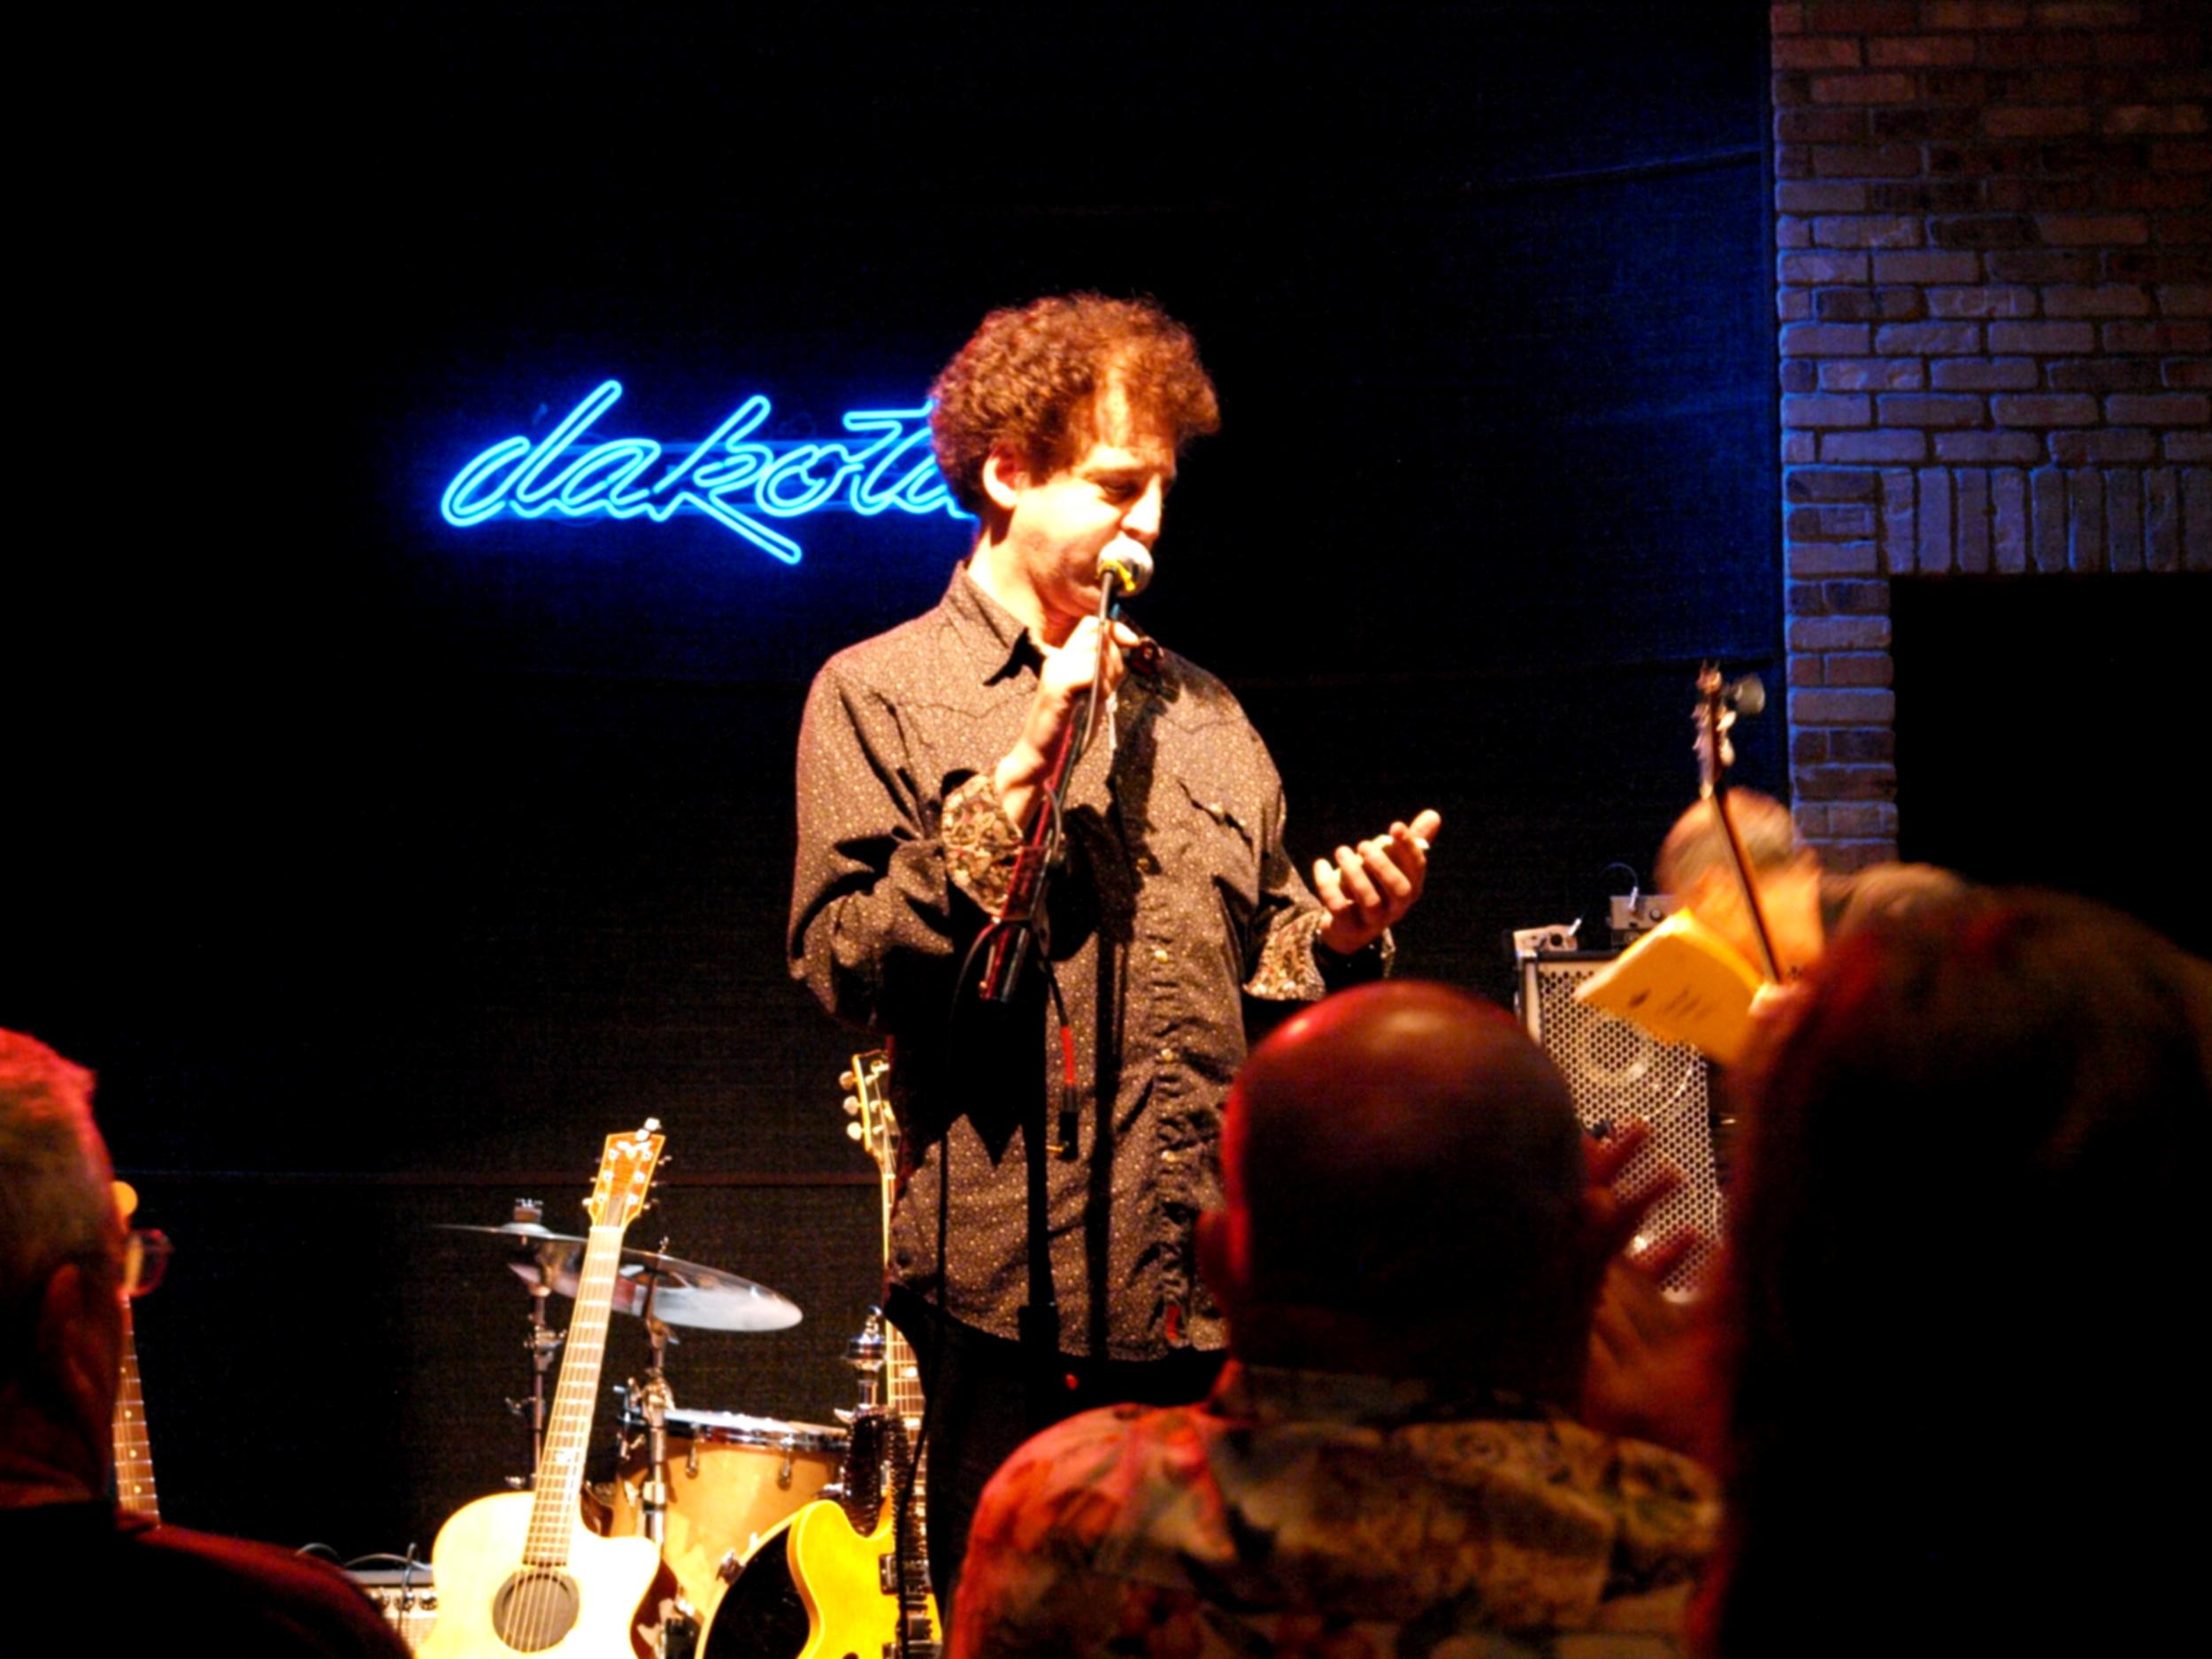 Magic Marc / An Evening With Scarlet Rivera / Dakota Jazz Club & Restaurant / Minneapolis, Minnesota / August 10th, 2014 / Photo by Neil Schloner